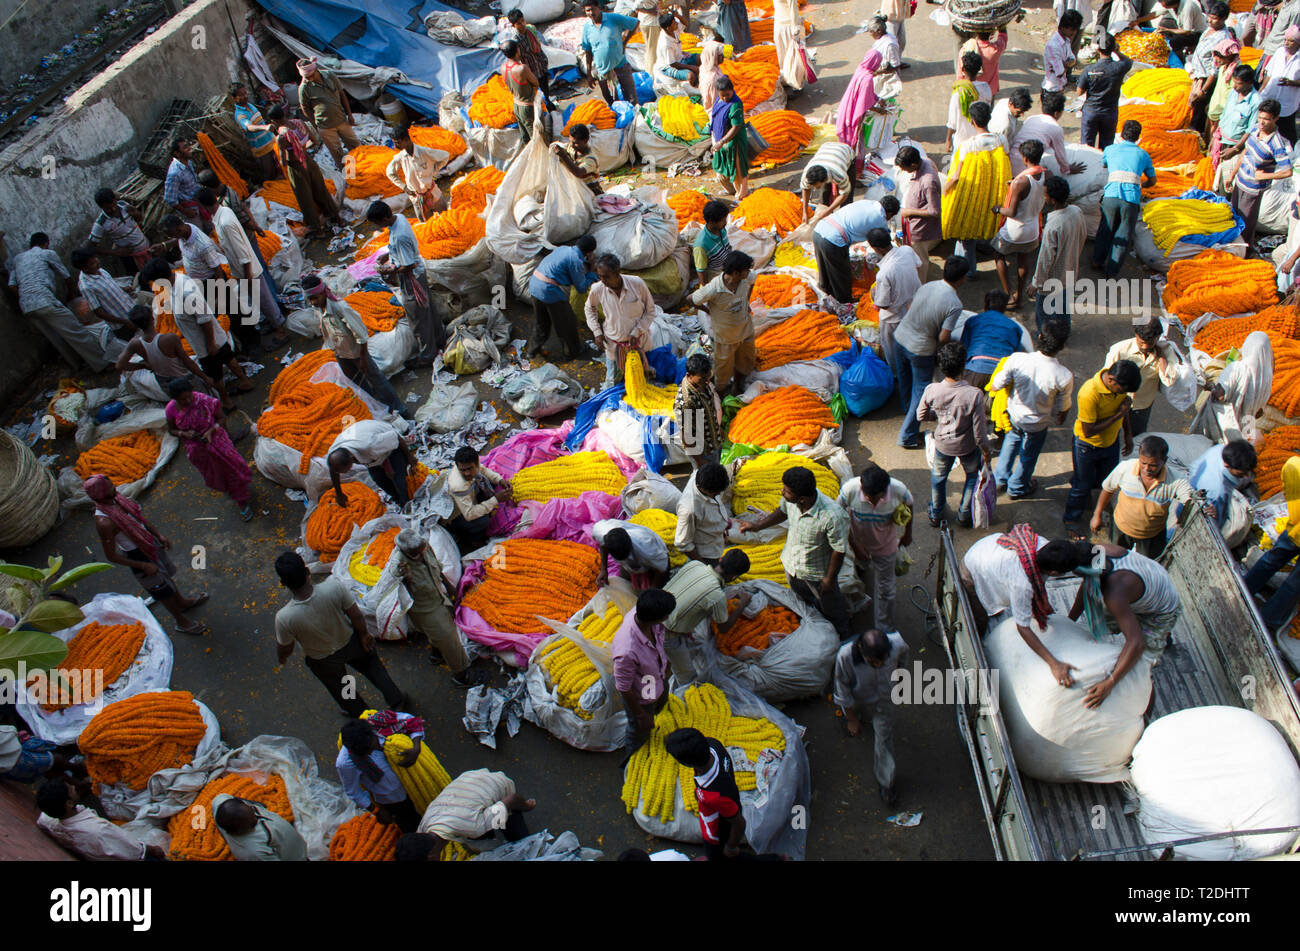 Busy flower market in Kolkata, India - Stock Image